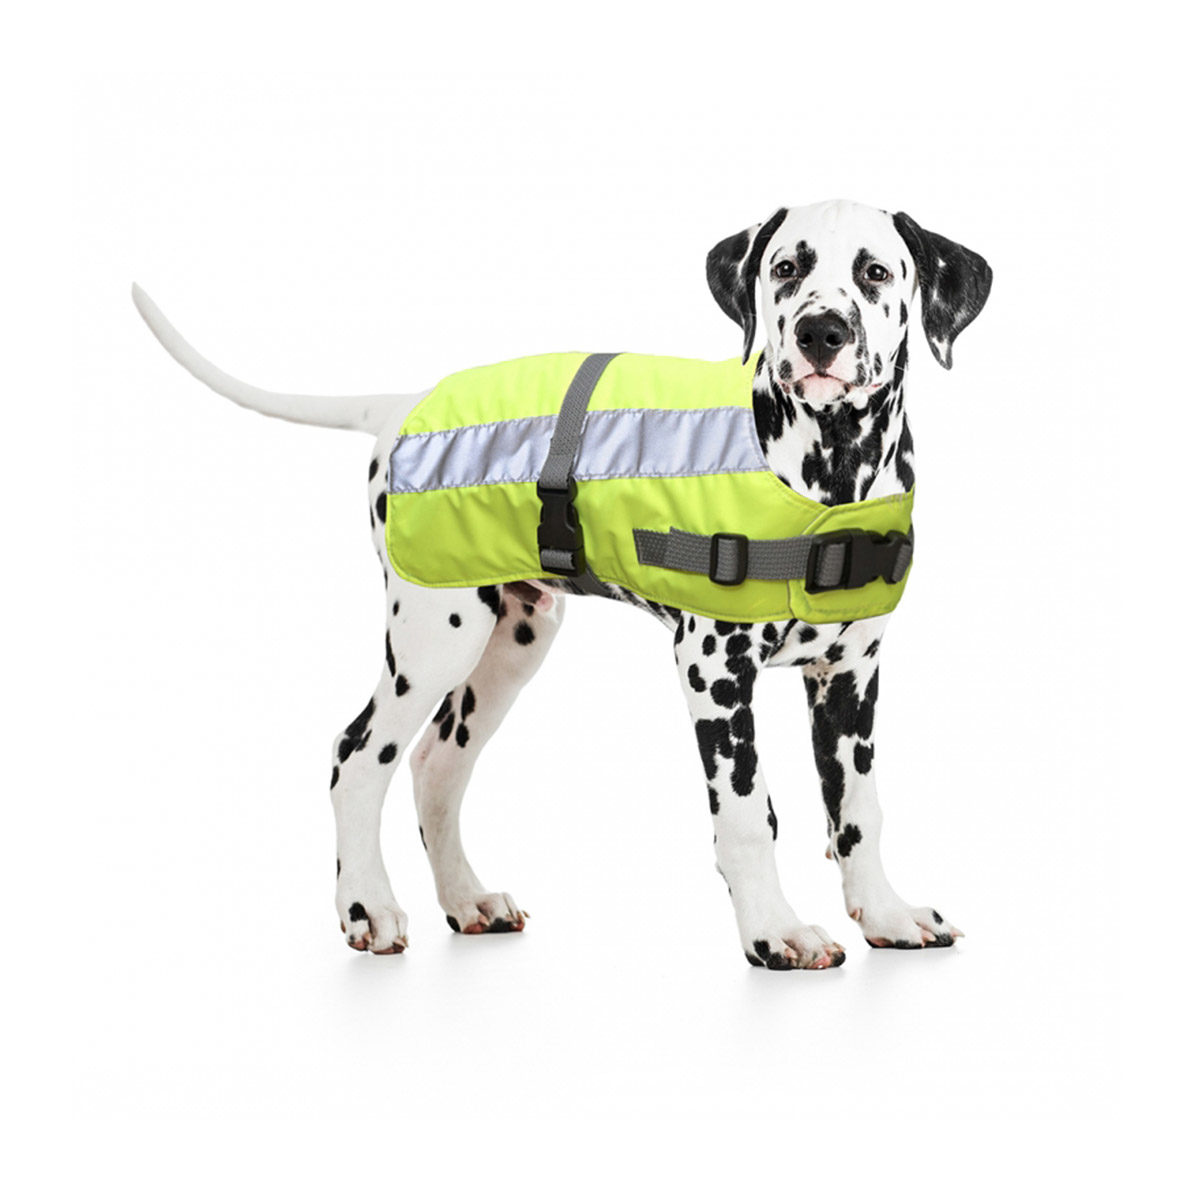 Duvo+ Flectalon Hi Vis Honden Jack Ruglengte 65 cm Geel - in Reflectie & Verlichting